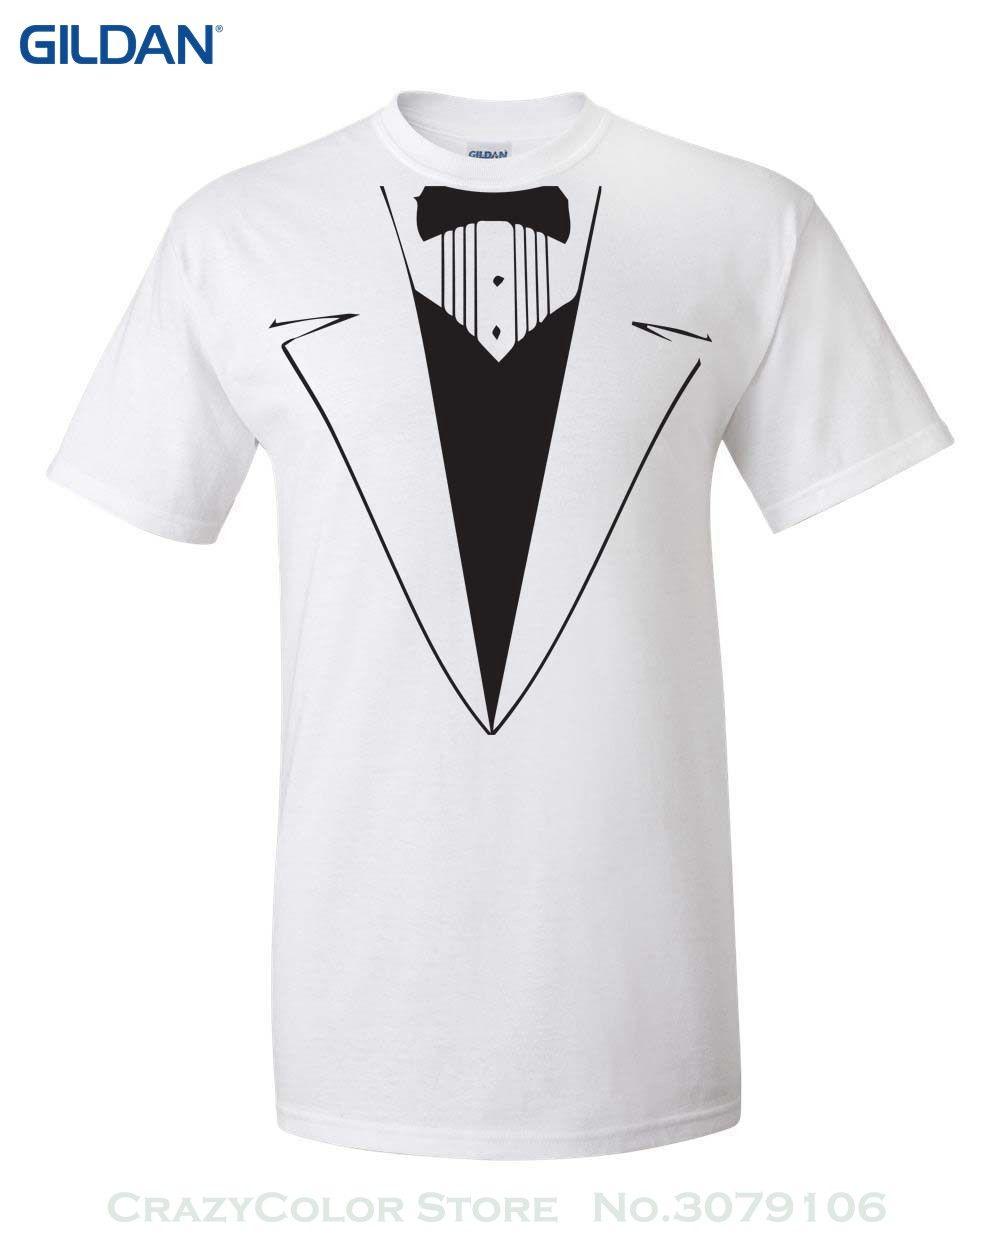 Tuxedo t-shirt formal tux design wedding groom funny men/'s t-shirt tee